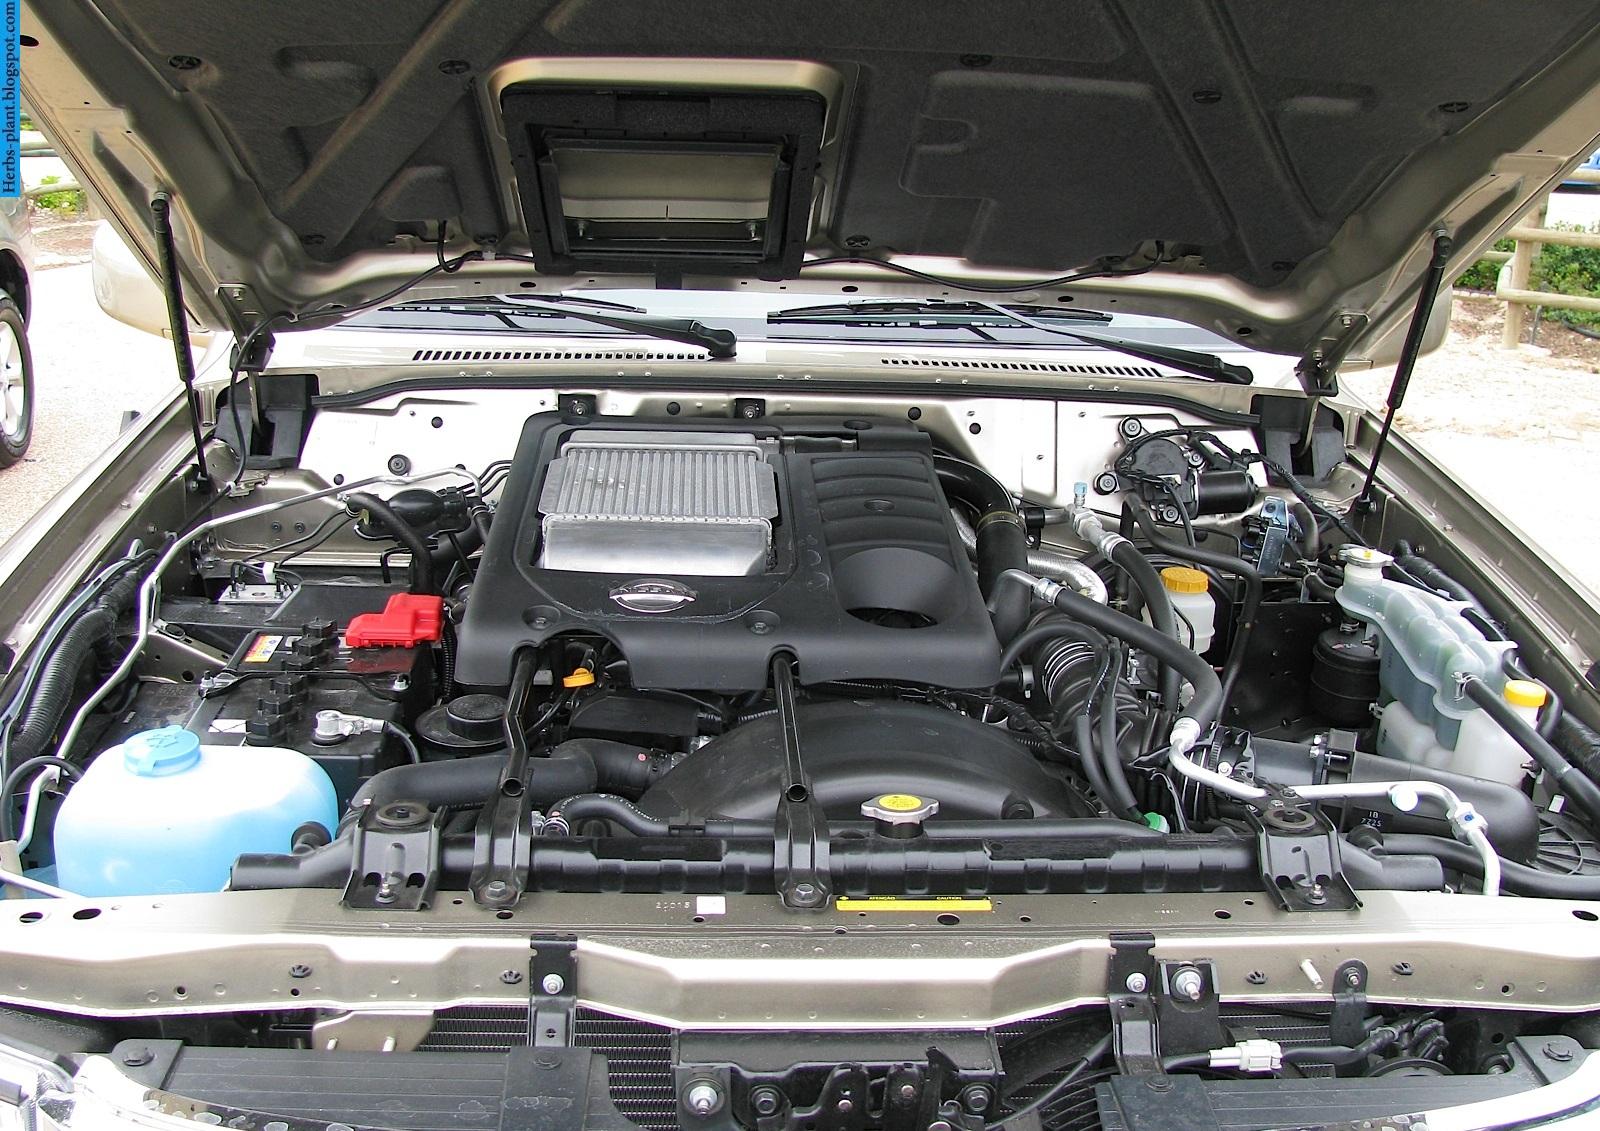 Nissan patrol car 2013 engine - صور محرك سيارة نيسان باترول 2013